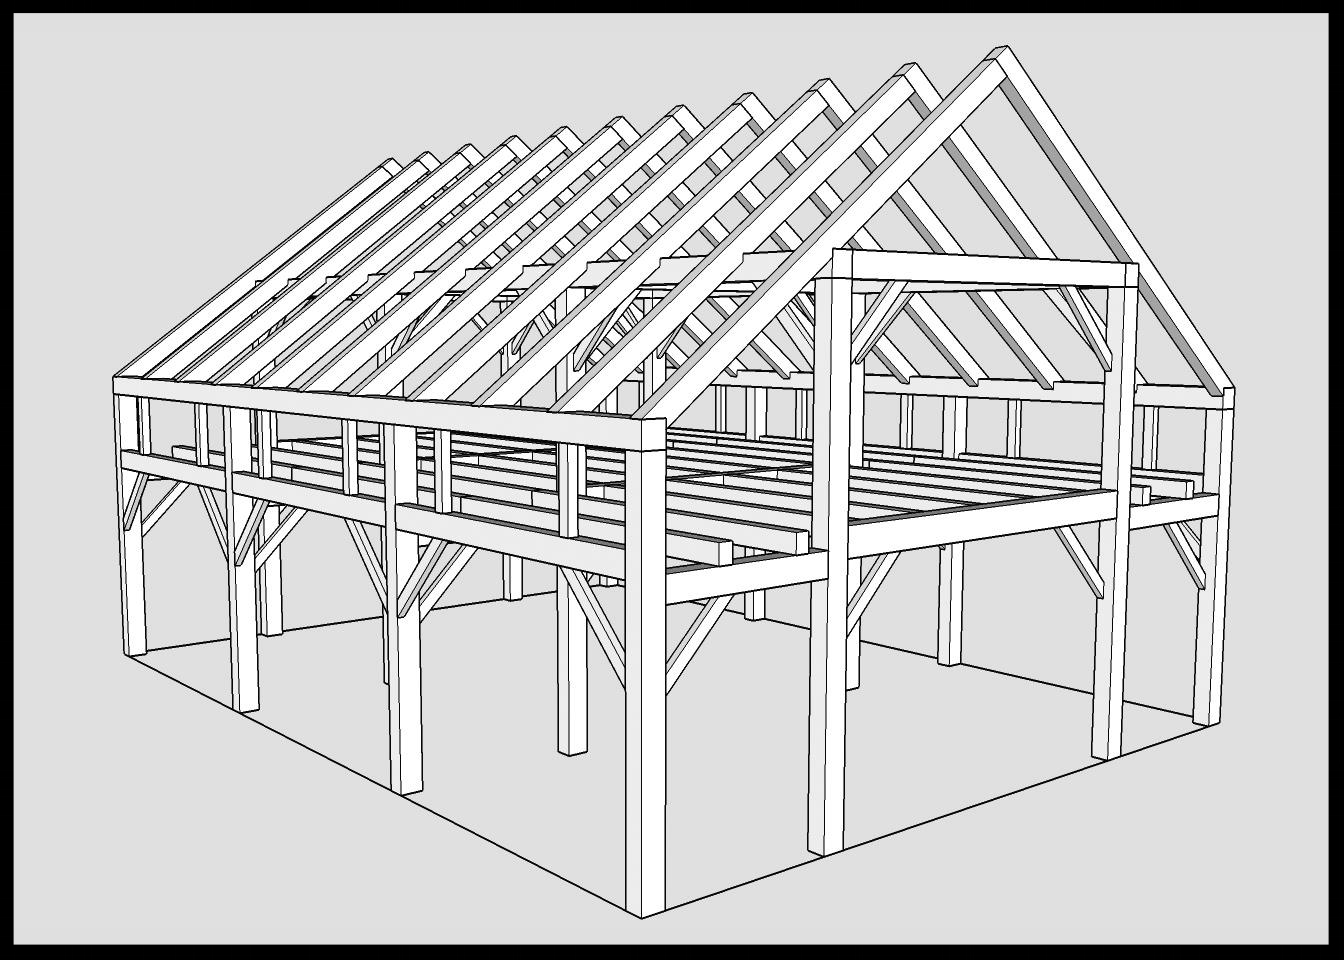 30x40 Barn Frame - Rough Pine Timbers $32,800Planed Pine Timbers $36,200